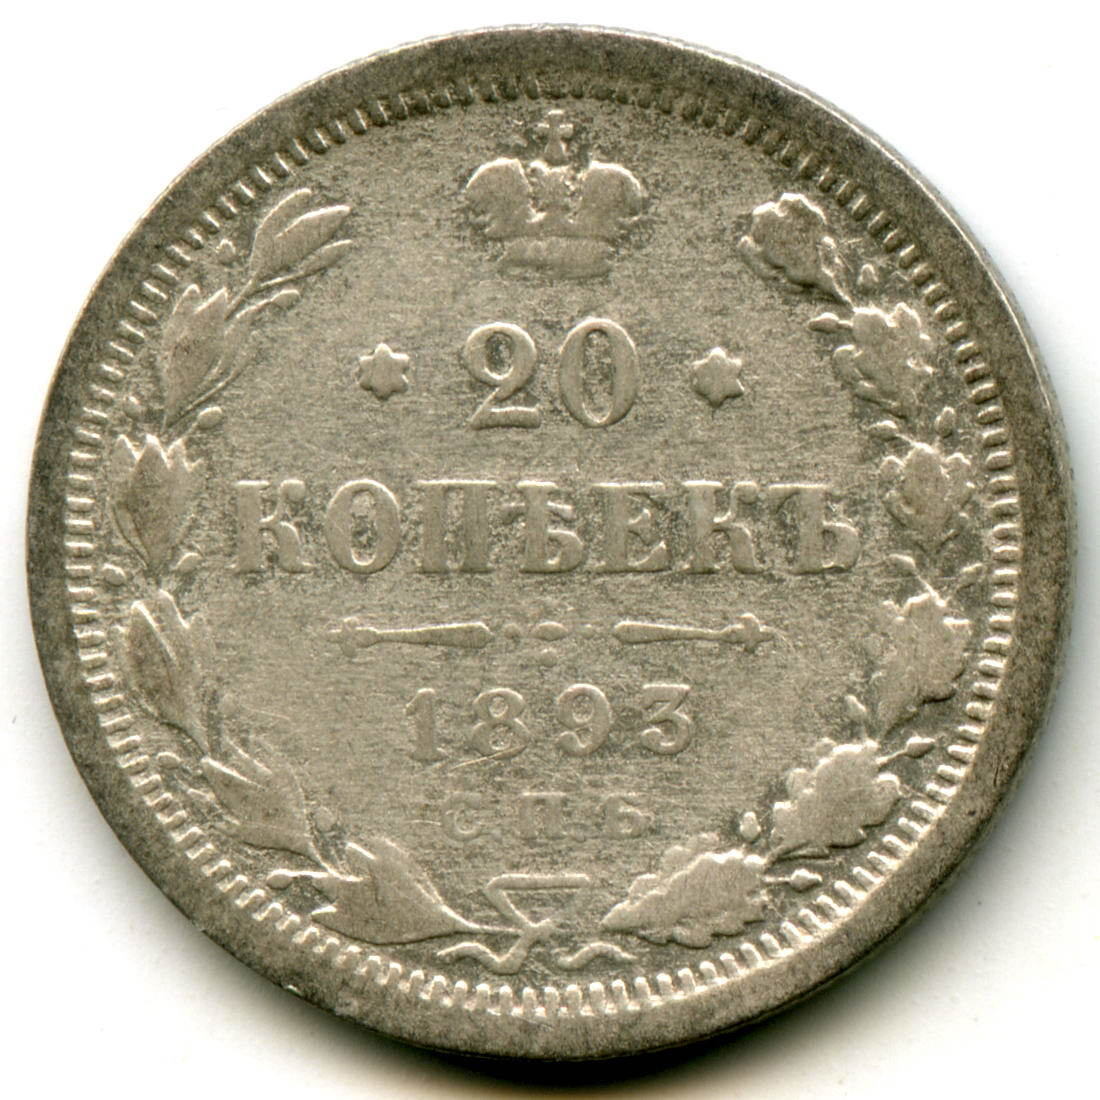 20 копеек 1893 год. СПБ АГ. Александр III. F+